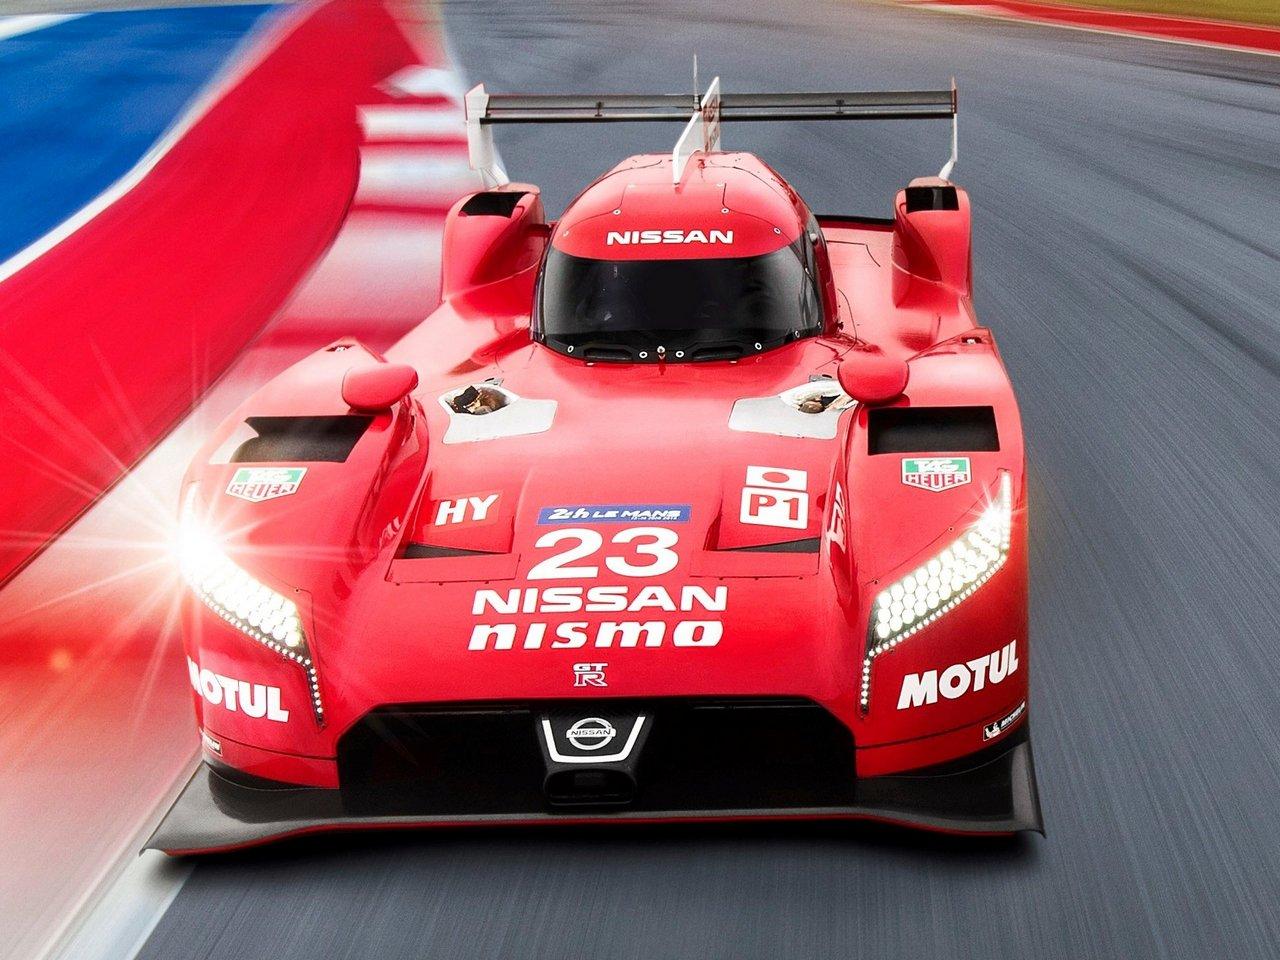 nissan-gt-r_lm-nismo-le-mans-2015-world-endurance-racing-hybrid-0-100_8